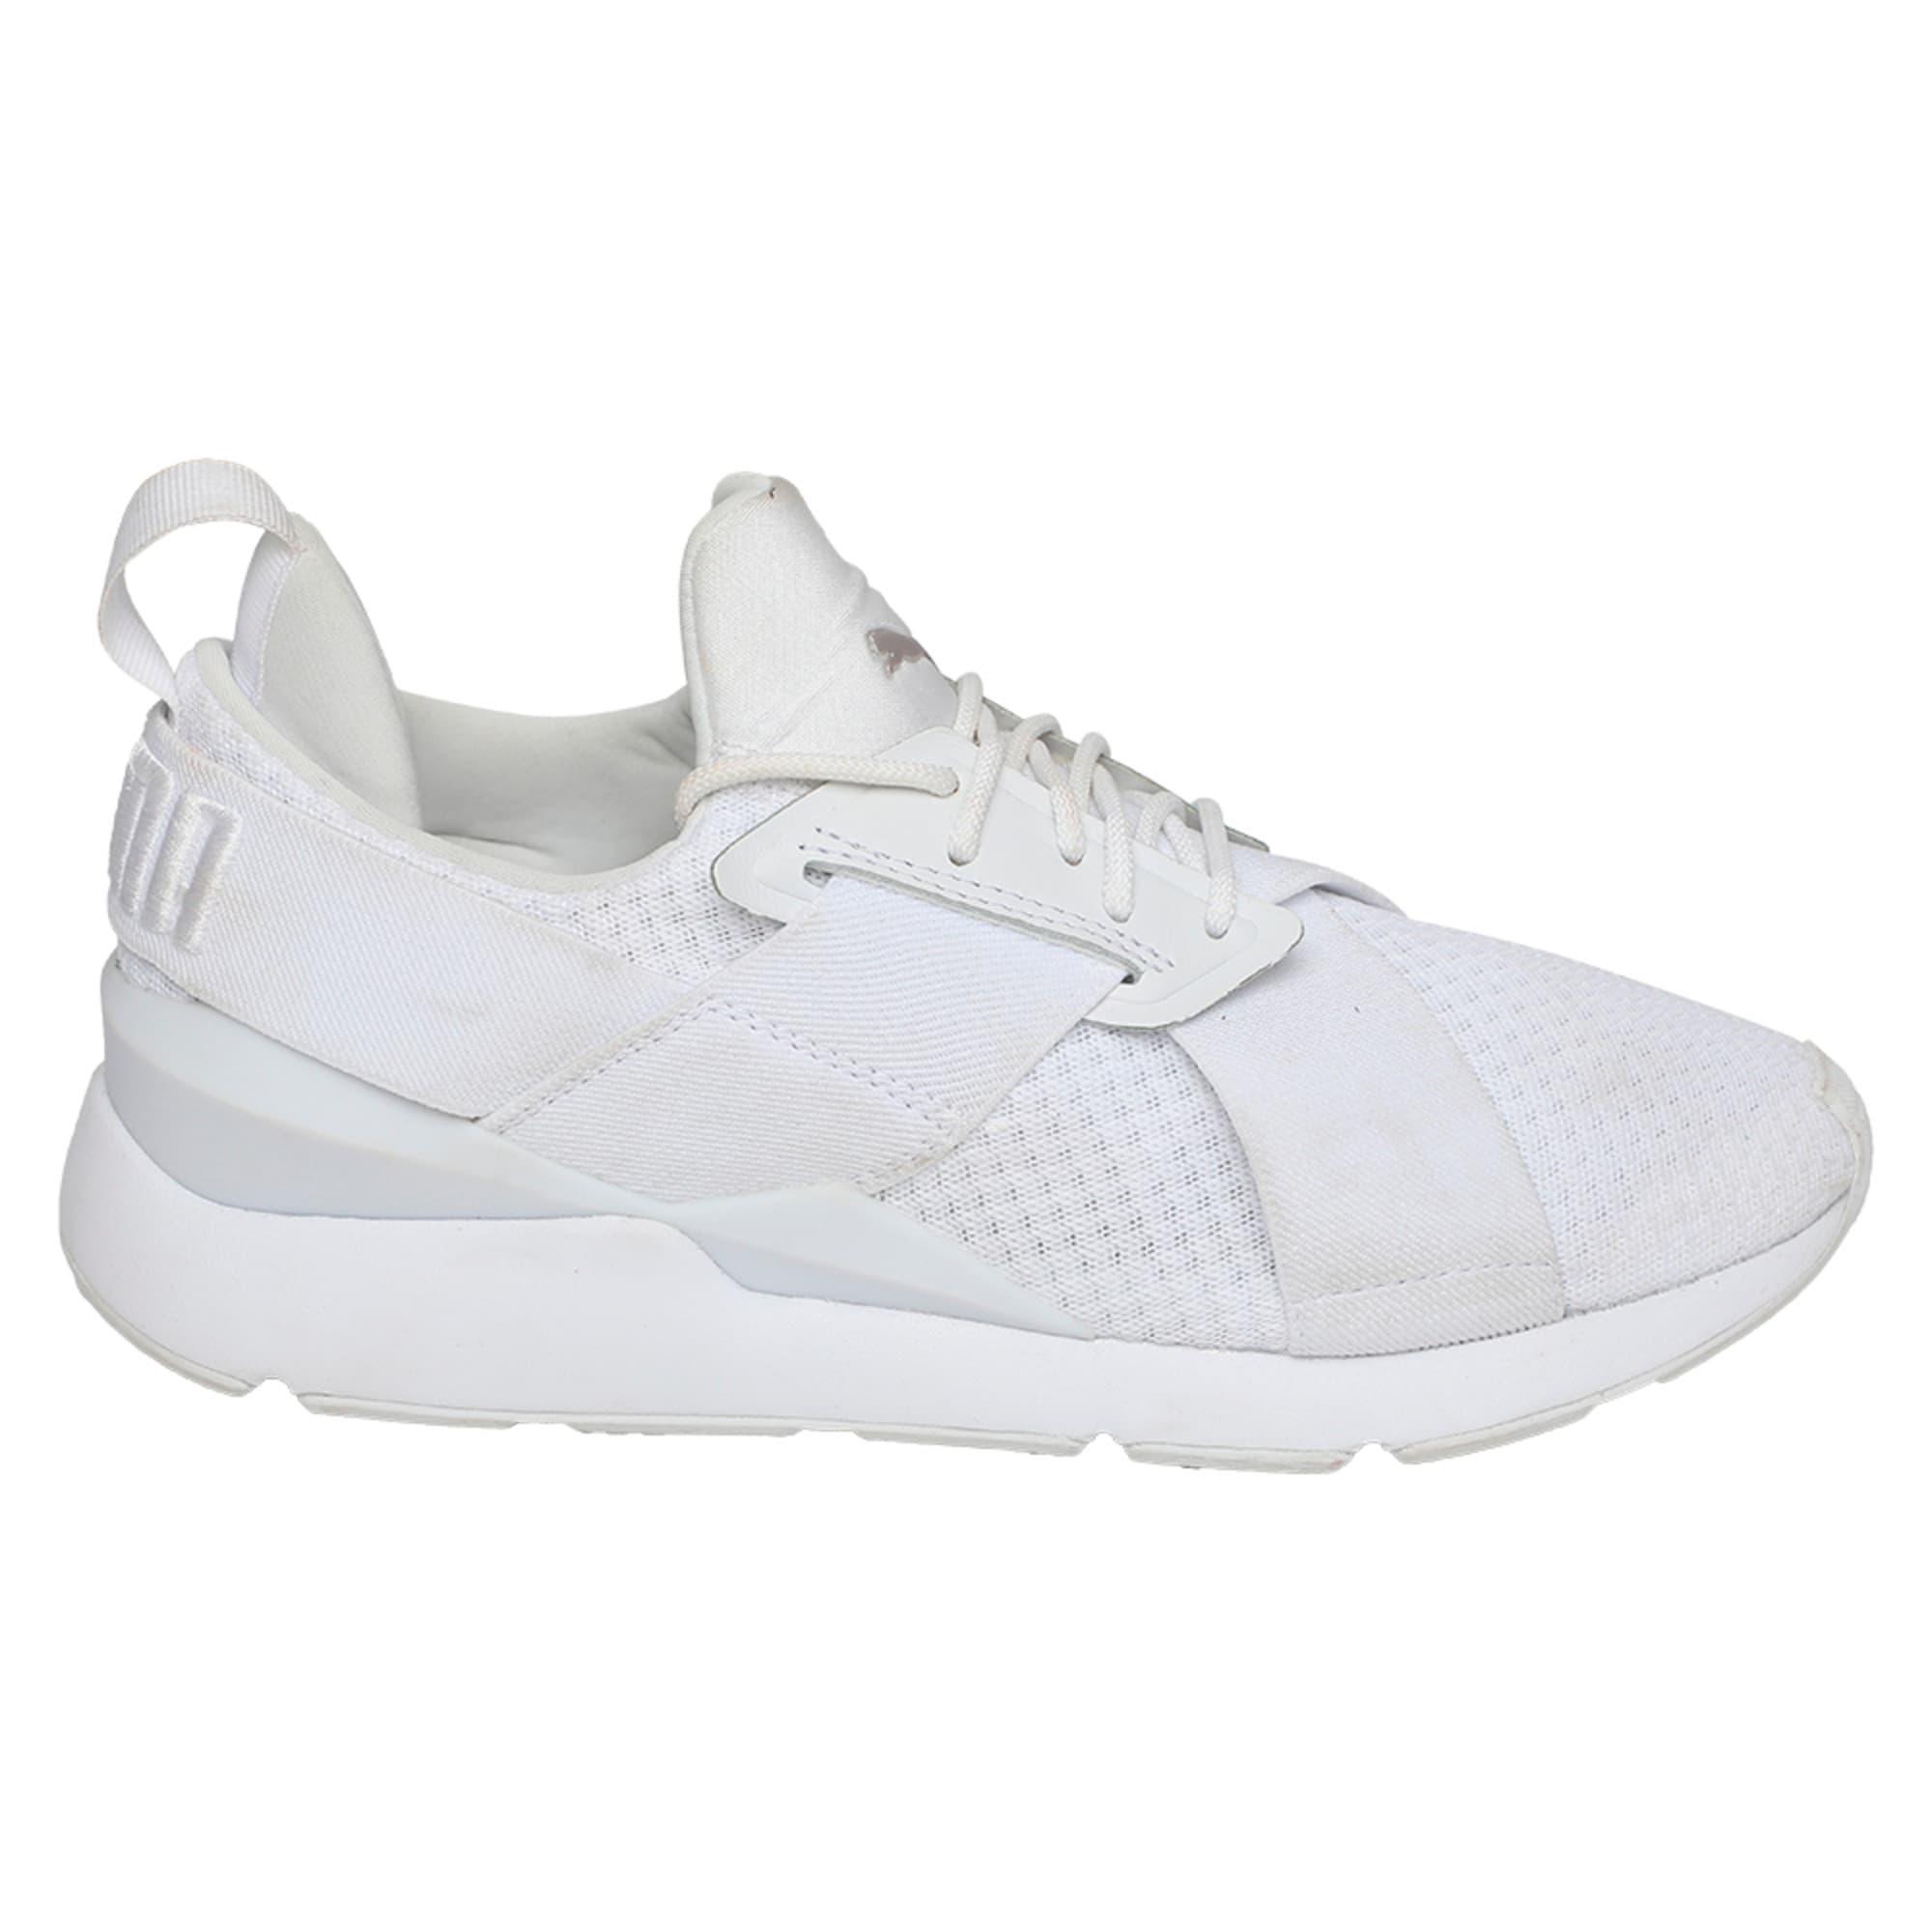 Thumbnail 5 of Muse En Pointe Women's Shoes, Puma White-Puma White, medium-IND